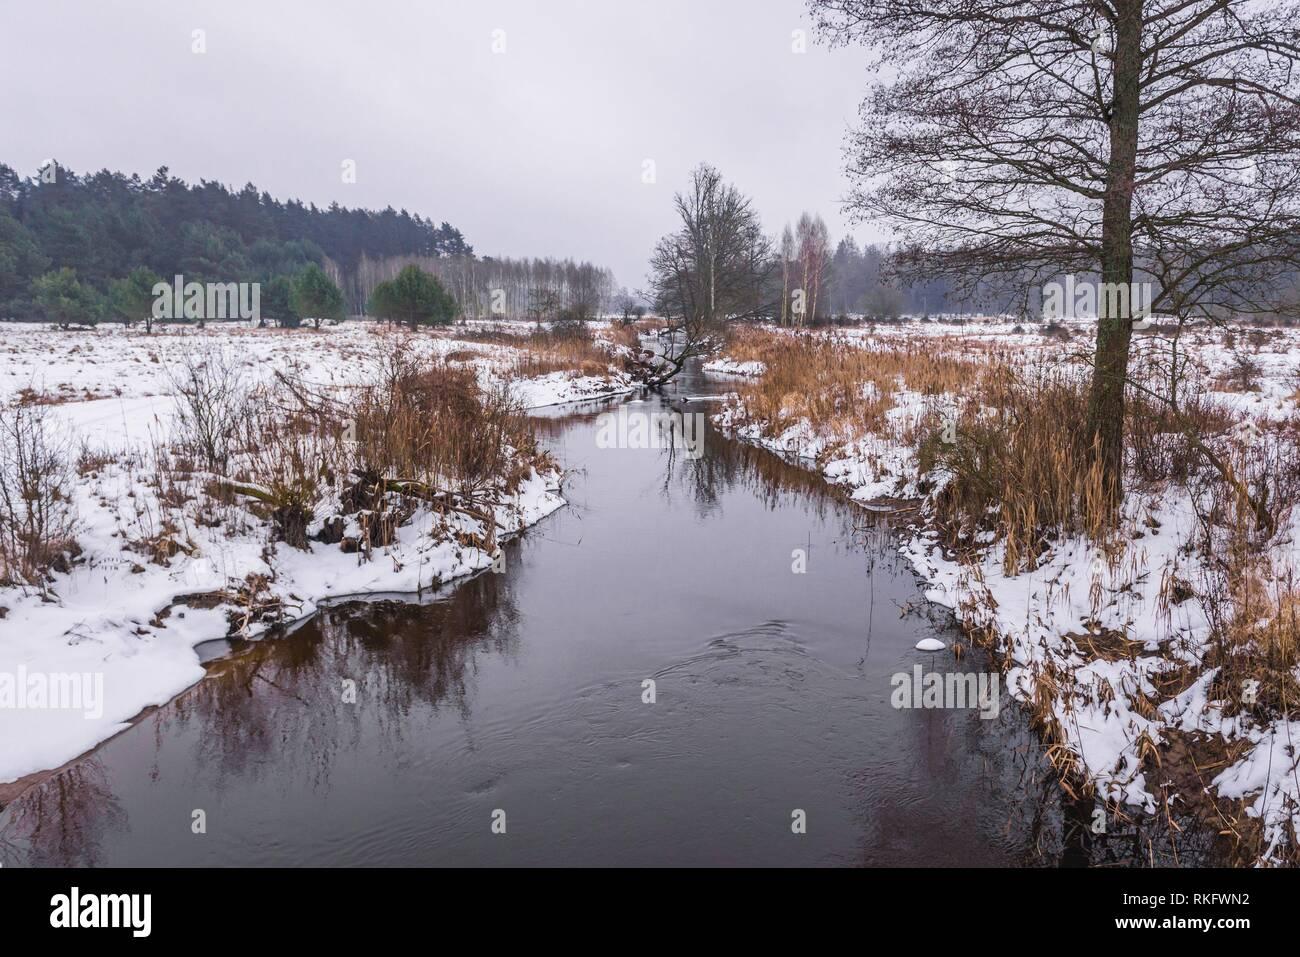 Narewka river, tributary of the Narew river in Gruszki village within Hajnowka County, Podlaskie Voivodeship of Poland. - Stock Image